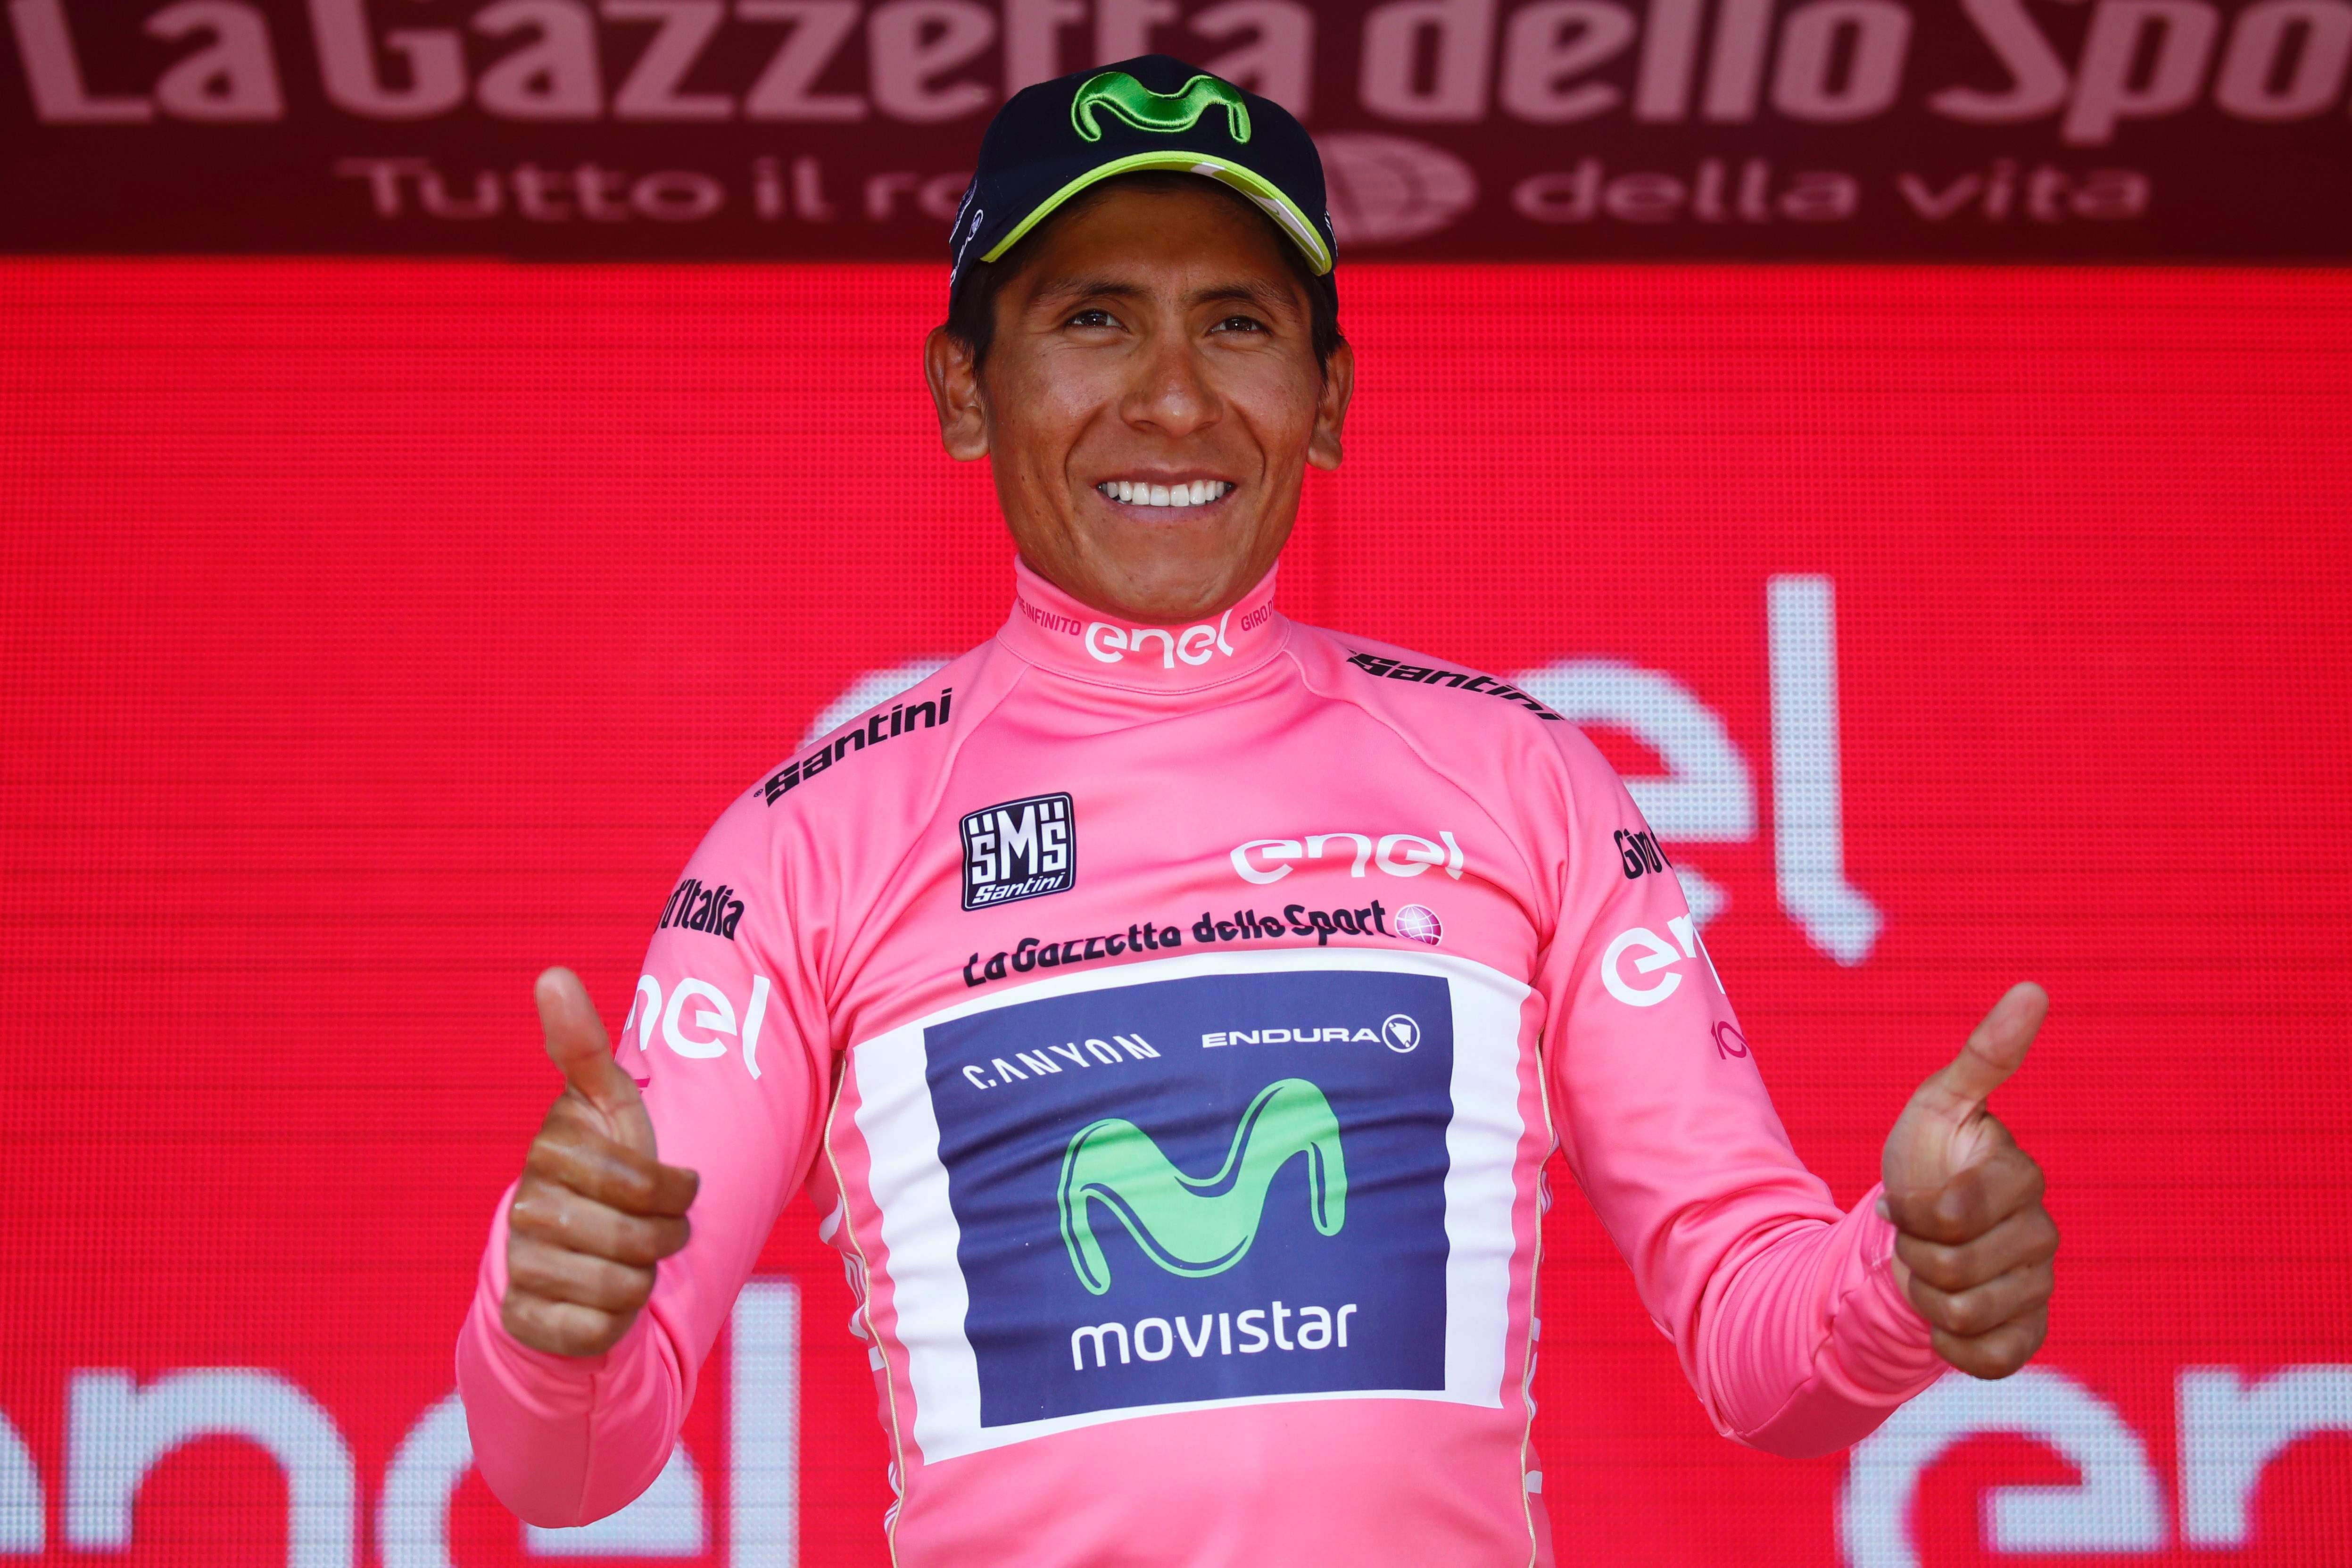 Cyclisme - Giro - Giro : Dumoulin perd la tête, Quintana en rose